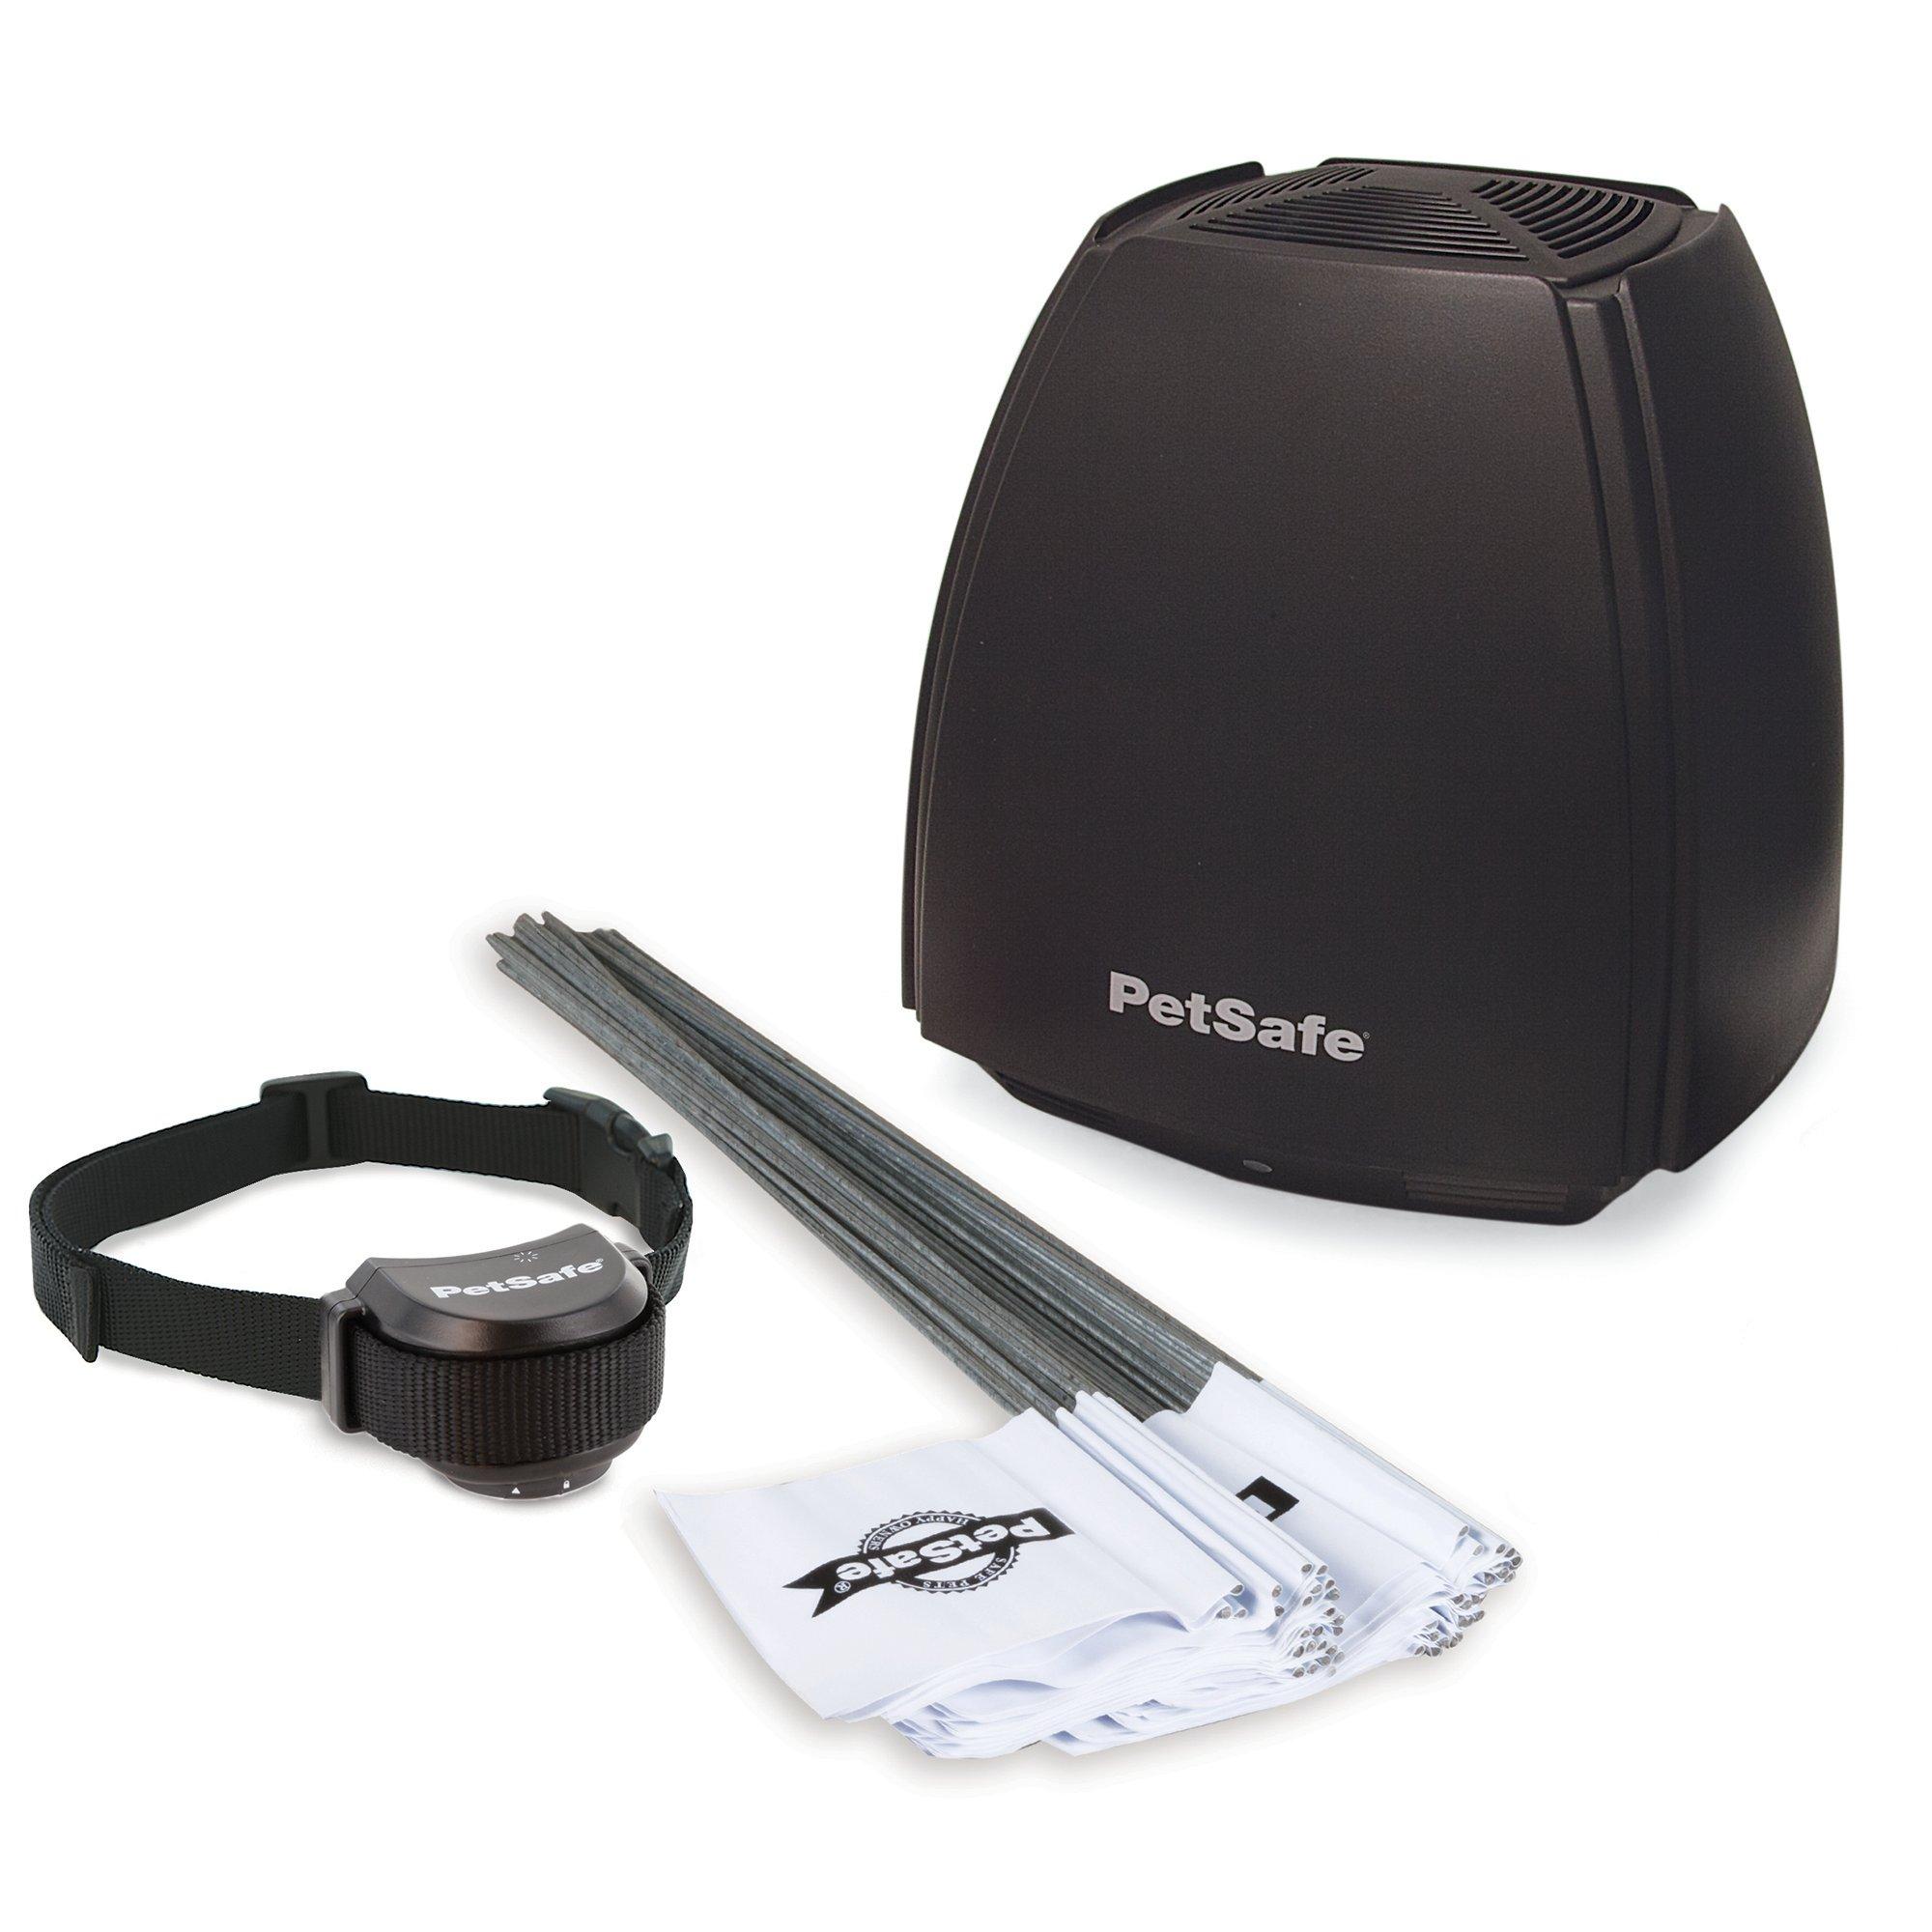 Petsafe Free To Roam Dog Wireless Fence Reviews